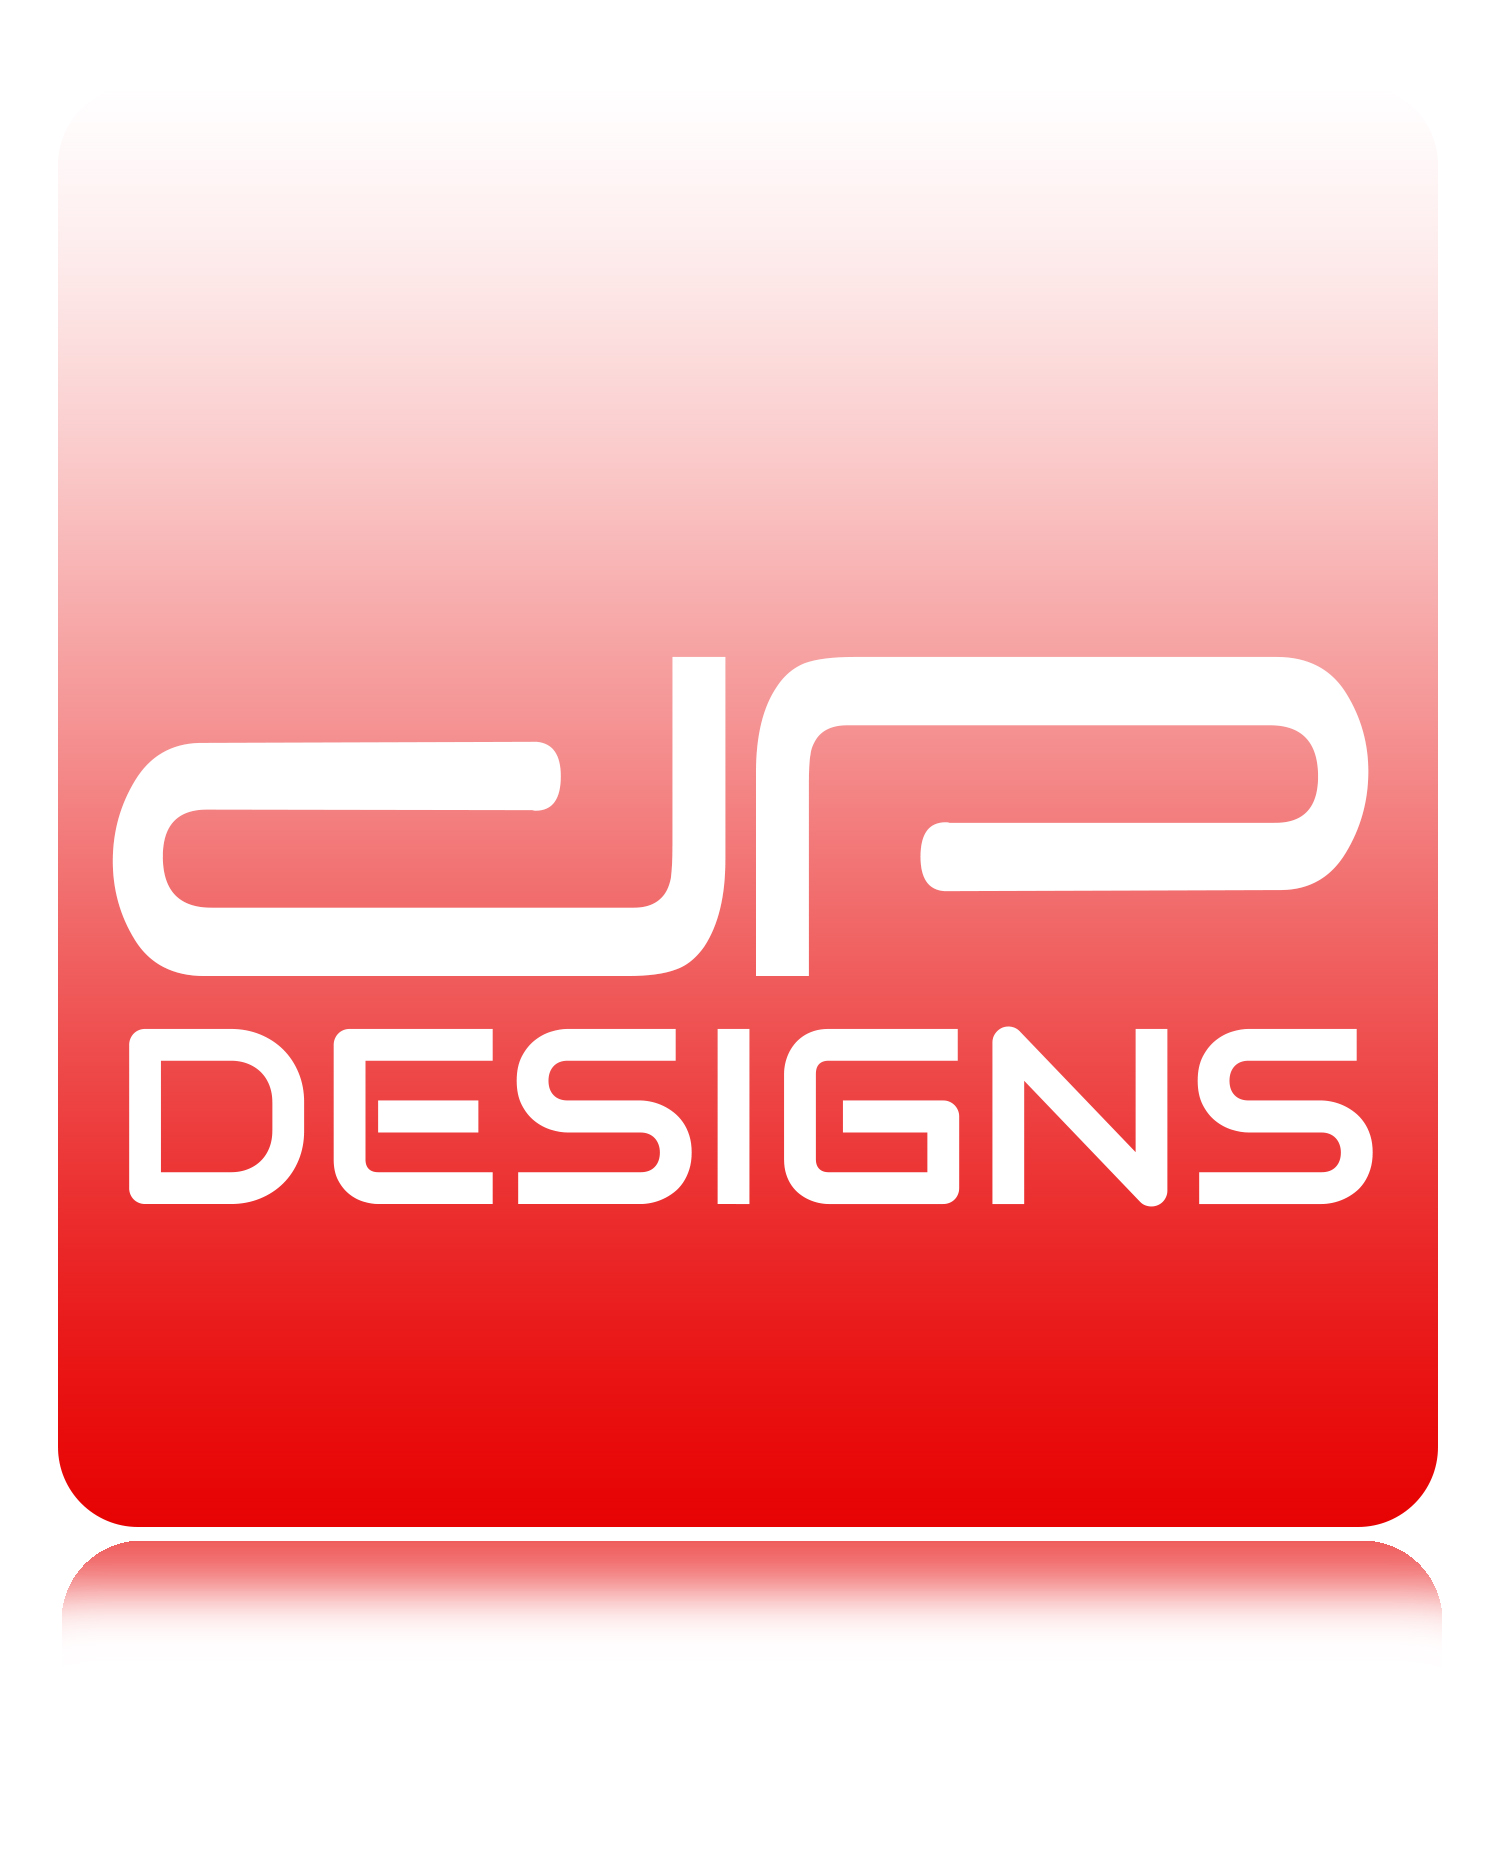 2021 College Fair - DP Designs logo